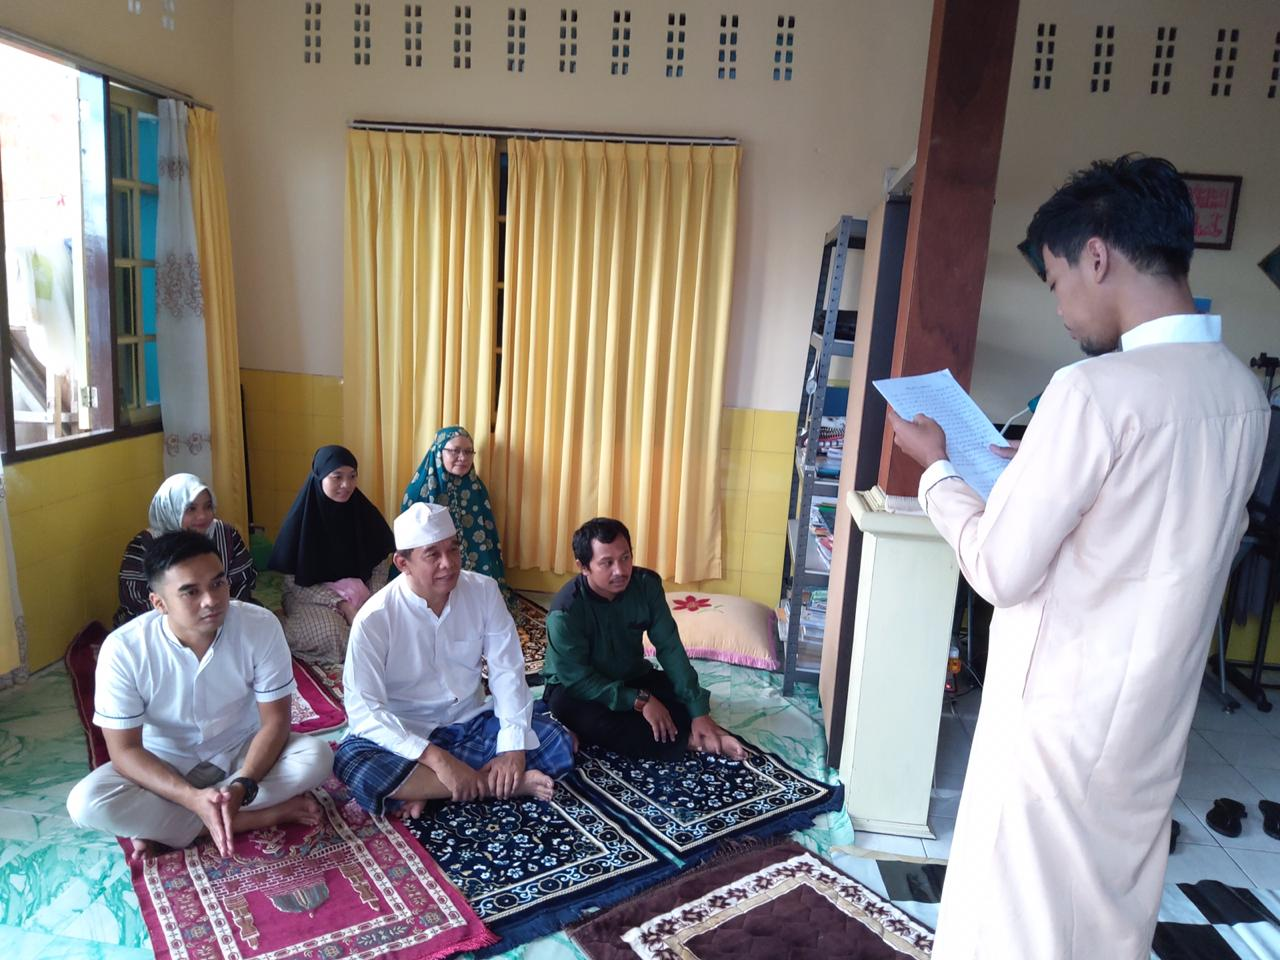 H Herry Fathamsyah Ketua LDII Balikpapan menyelenggarakan Salat Idulfitri di rumah saja, Minggu (24/5). Foto: dok. H Herry Fathamsyah